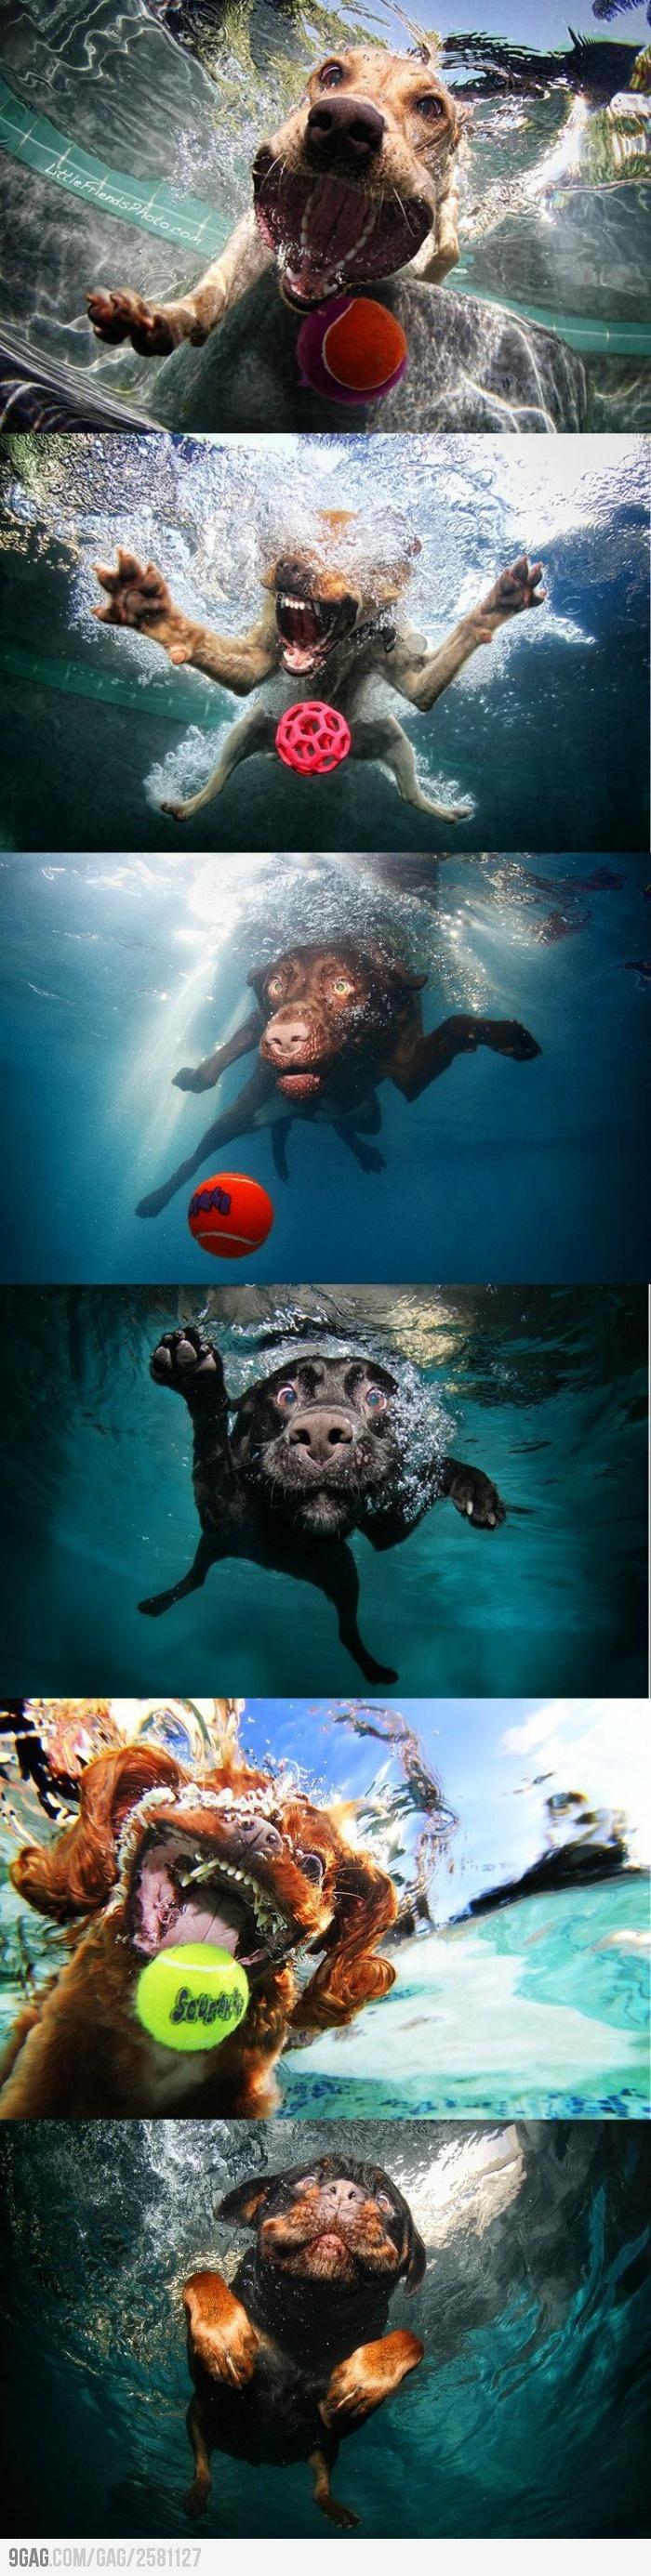 Dogs underwater have crazy eyes